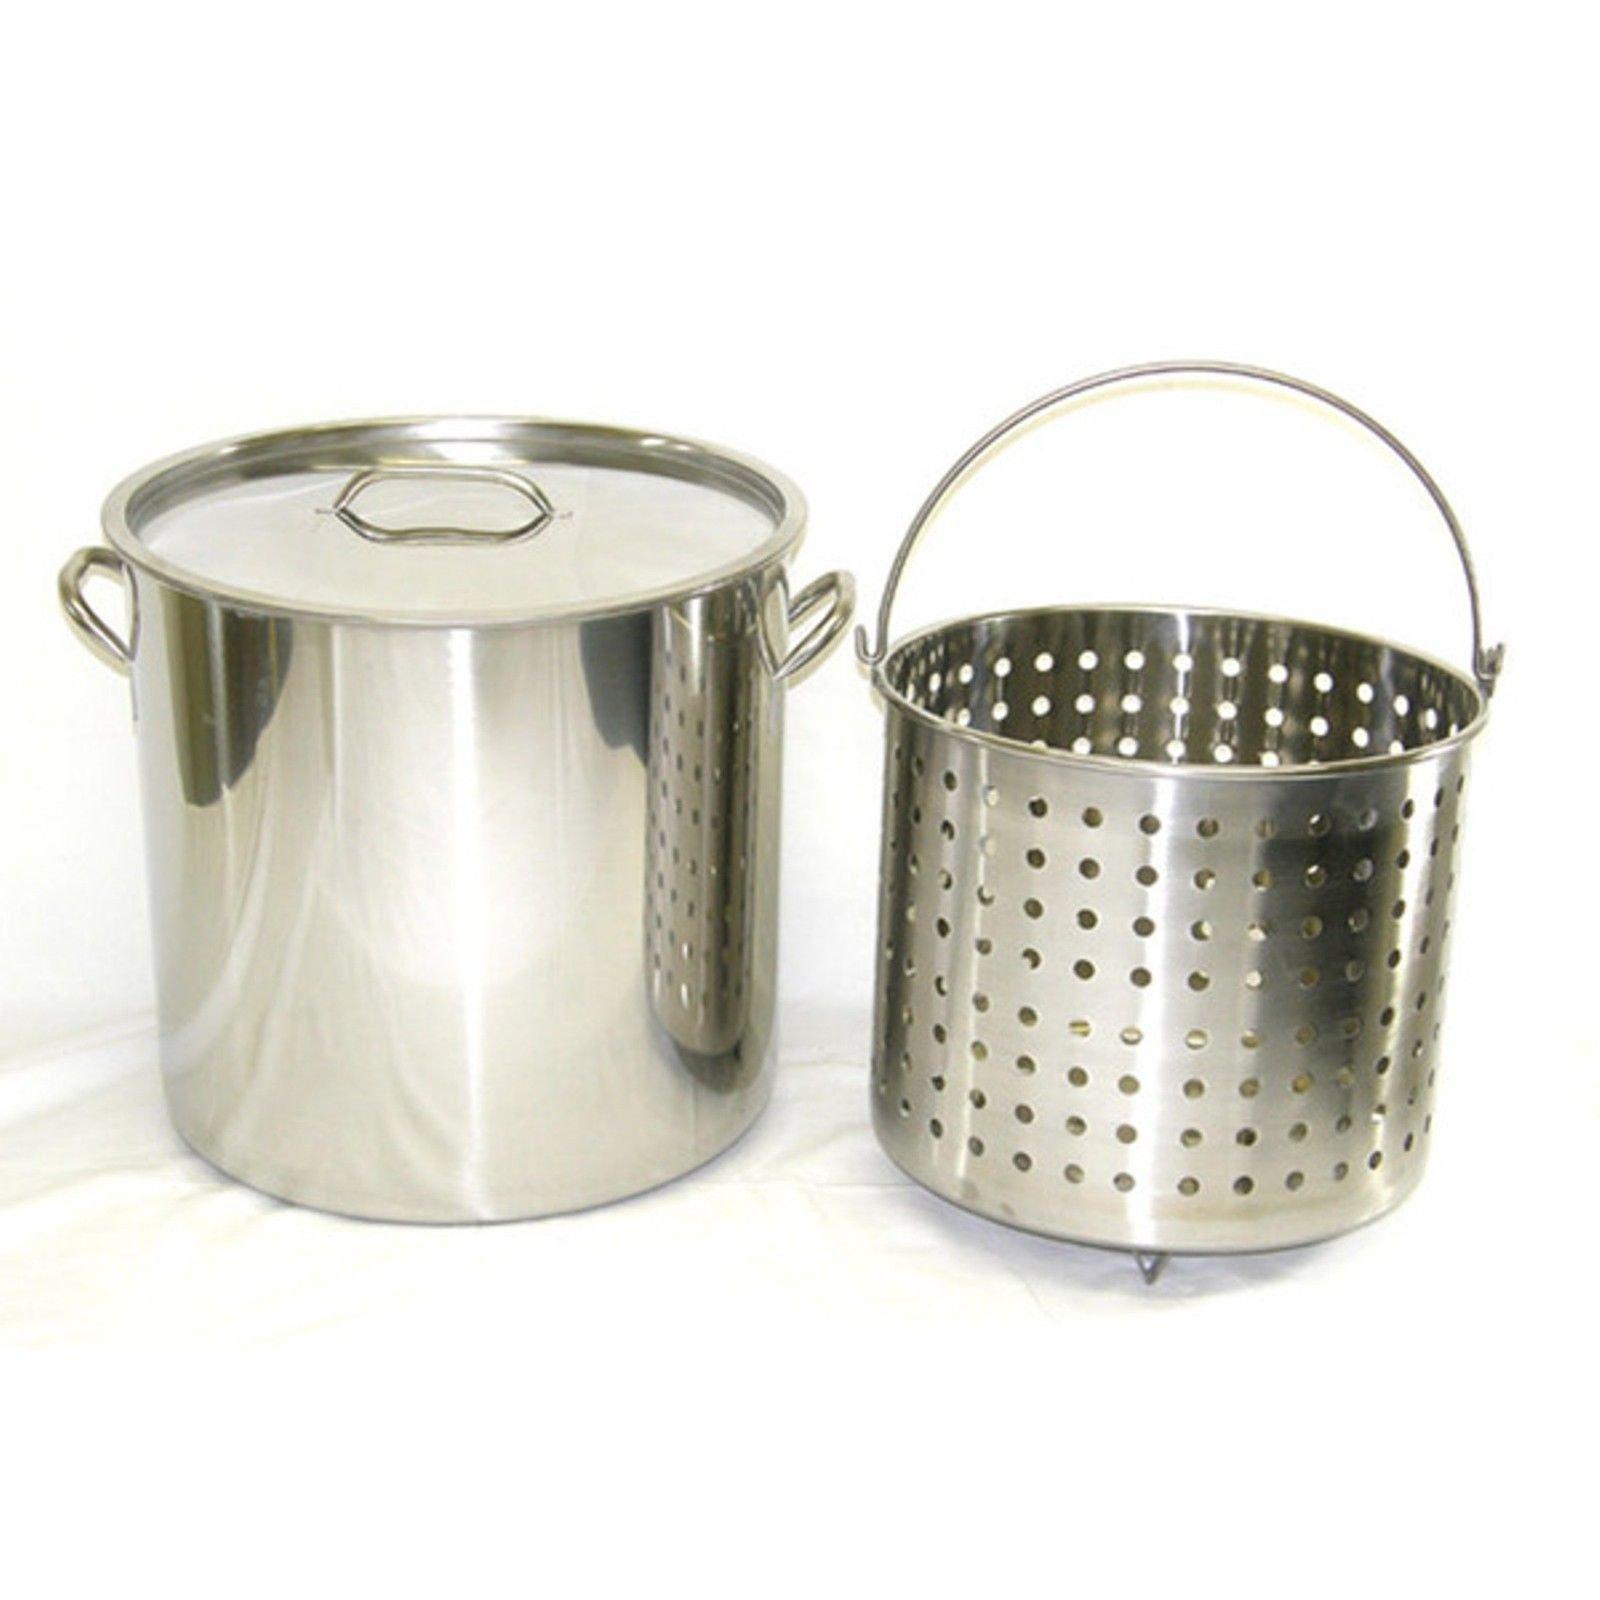 Ballington 13-Gal 16'' Stainless Steel Stock Pot w Deep Steamer/Boil Basket & Lid